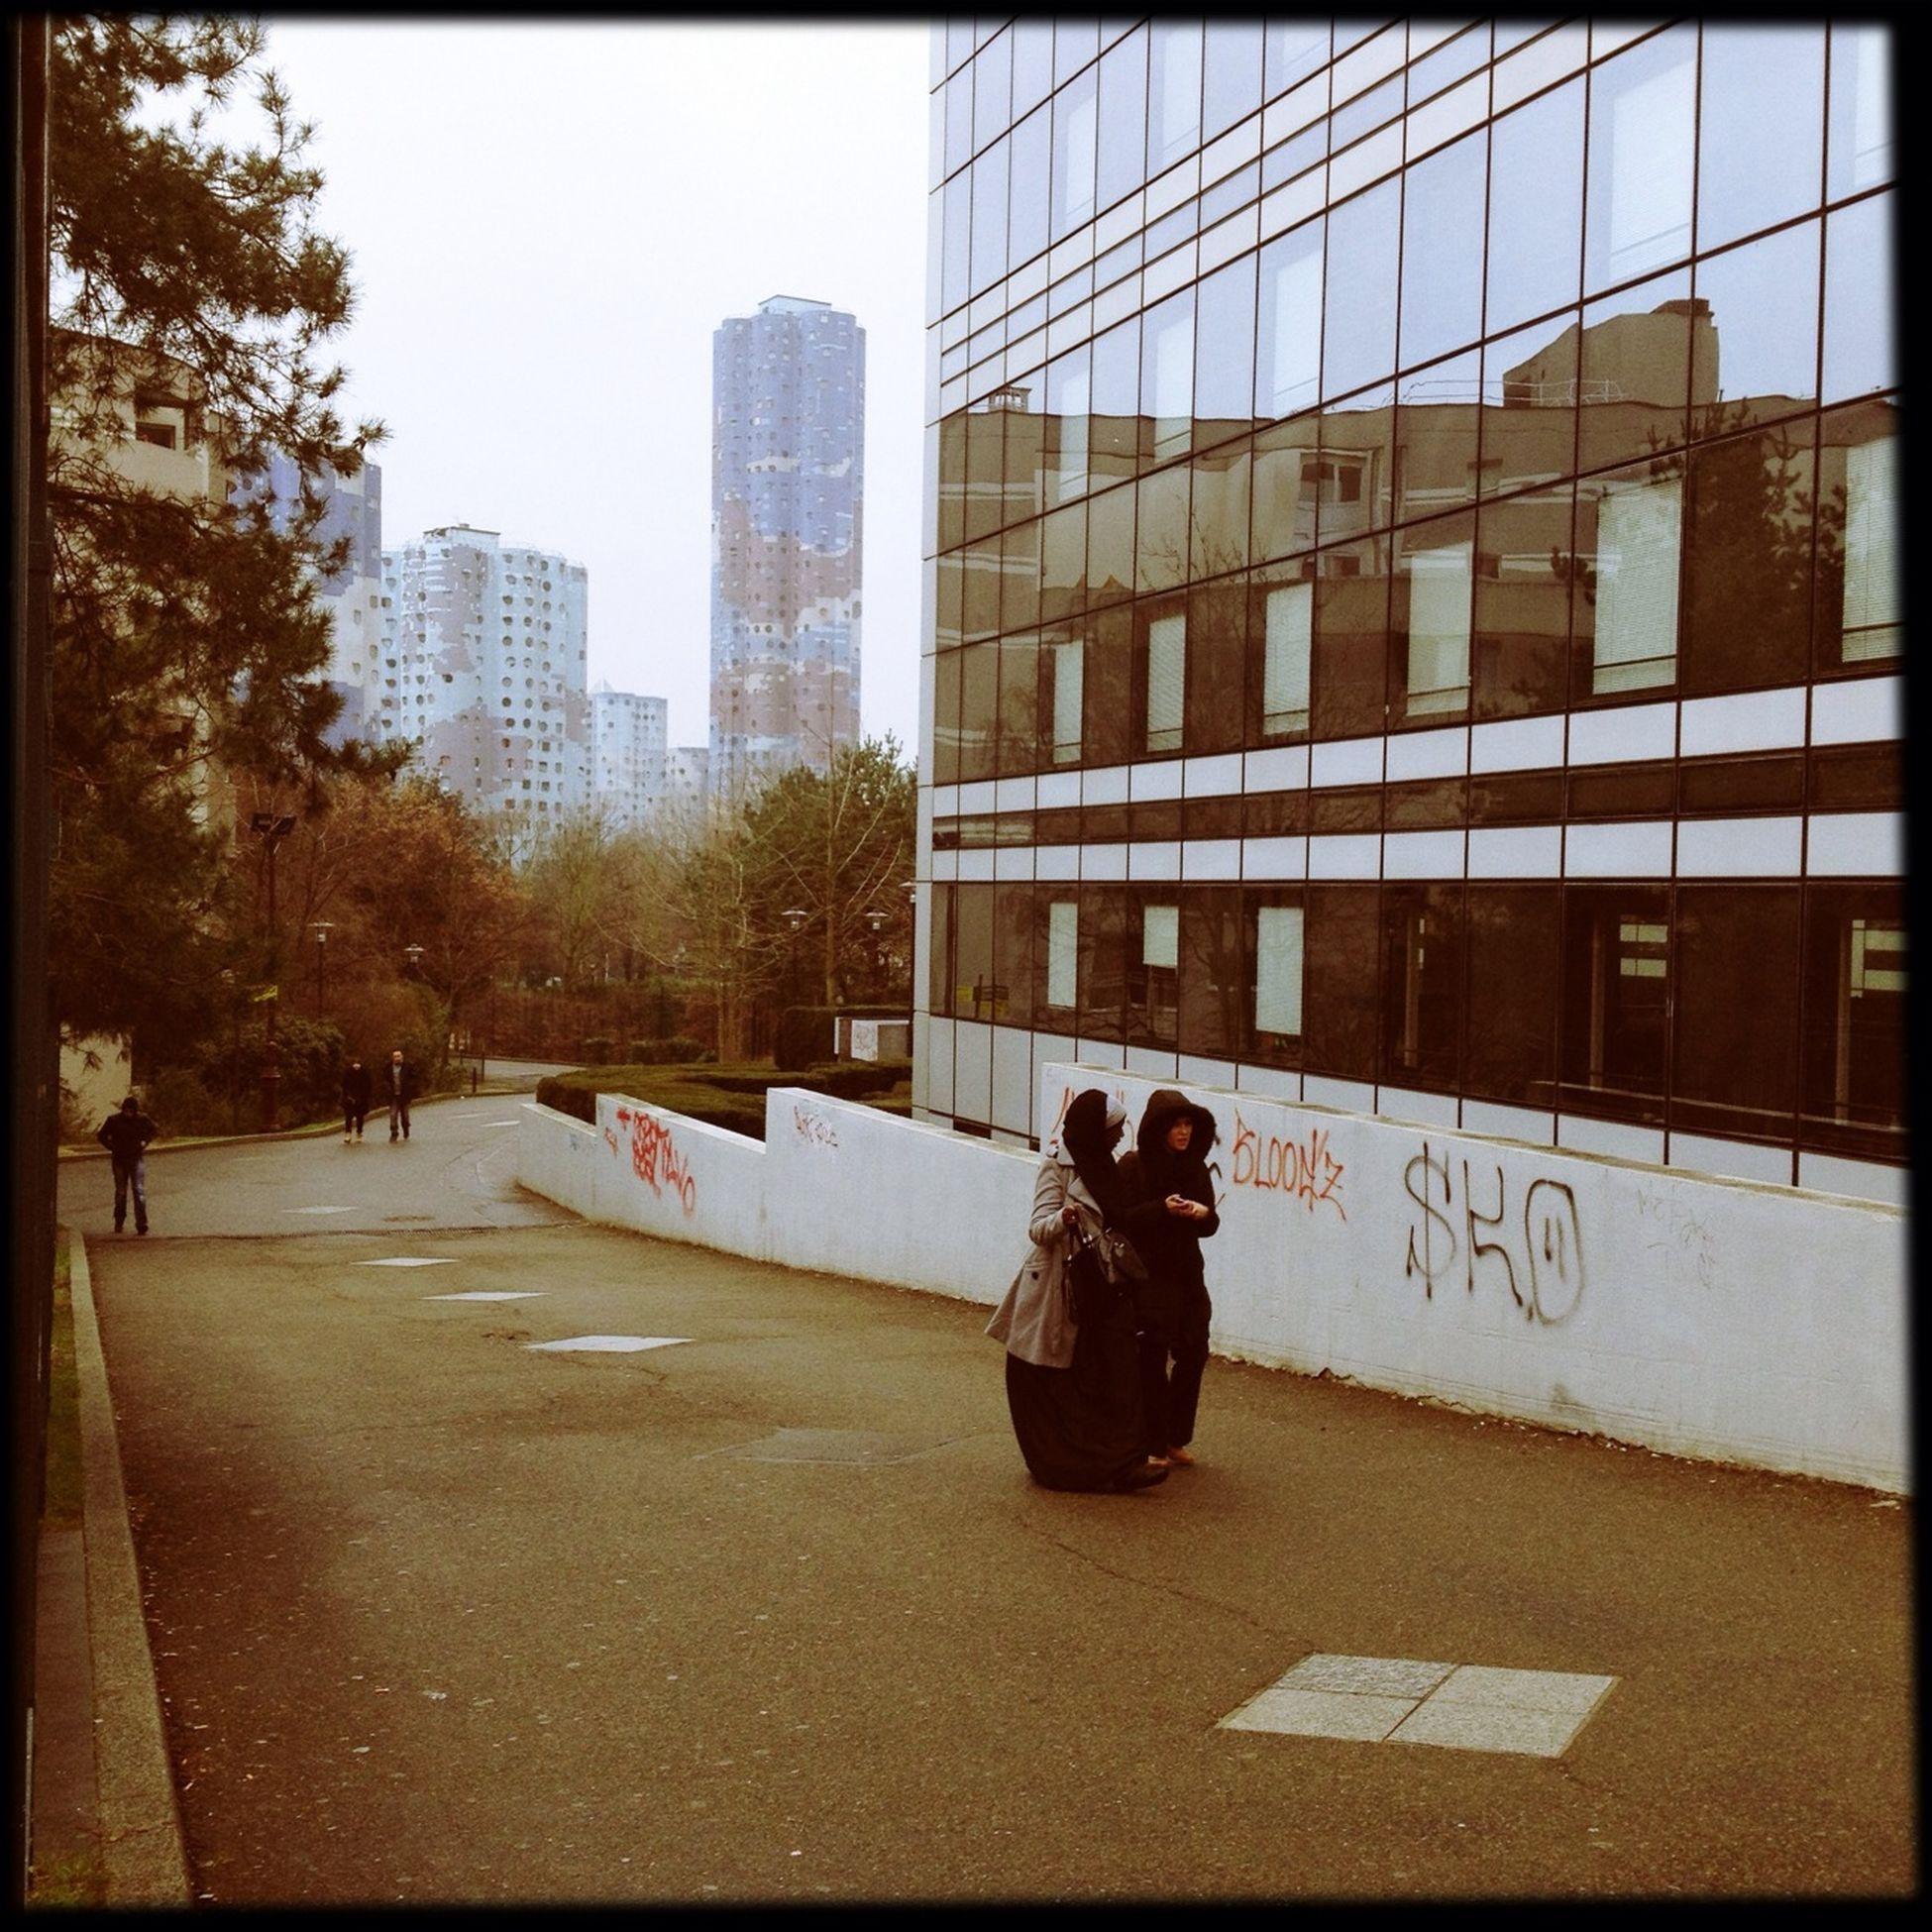 the way forward, city life, narrow, urban, direction